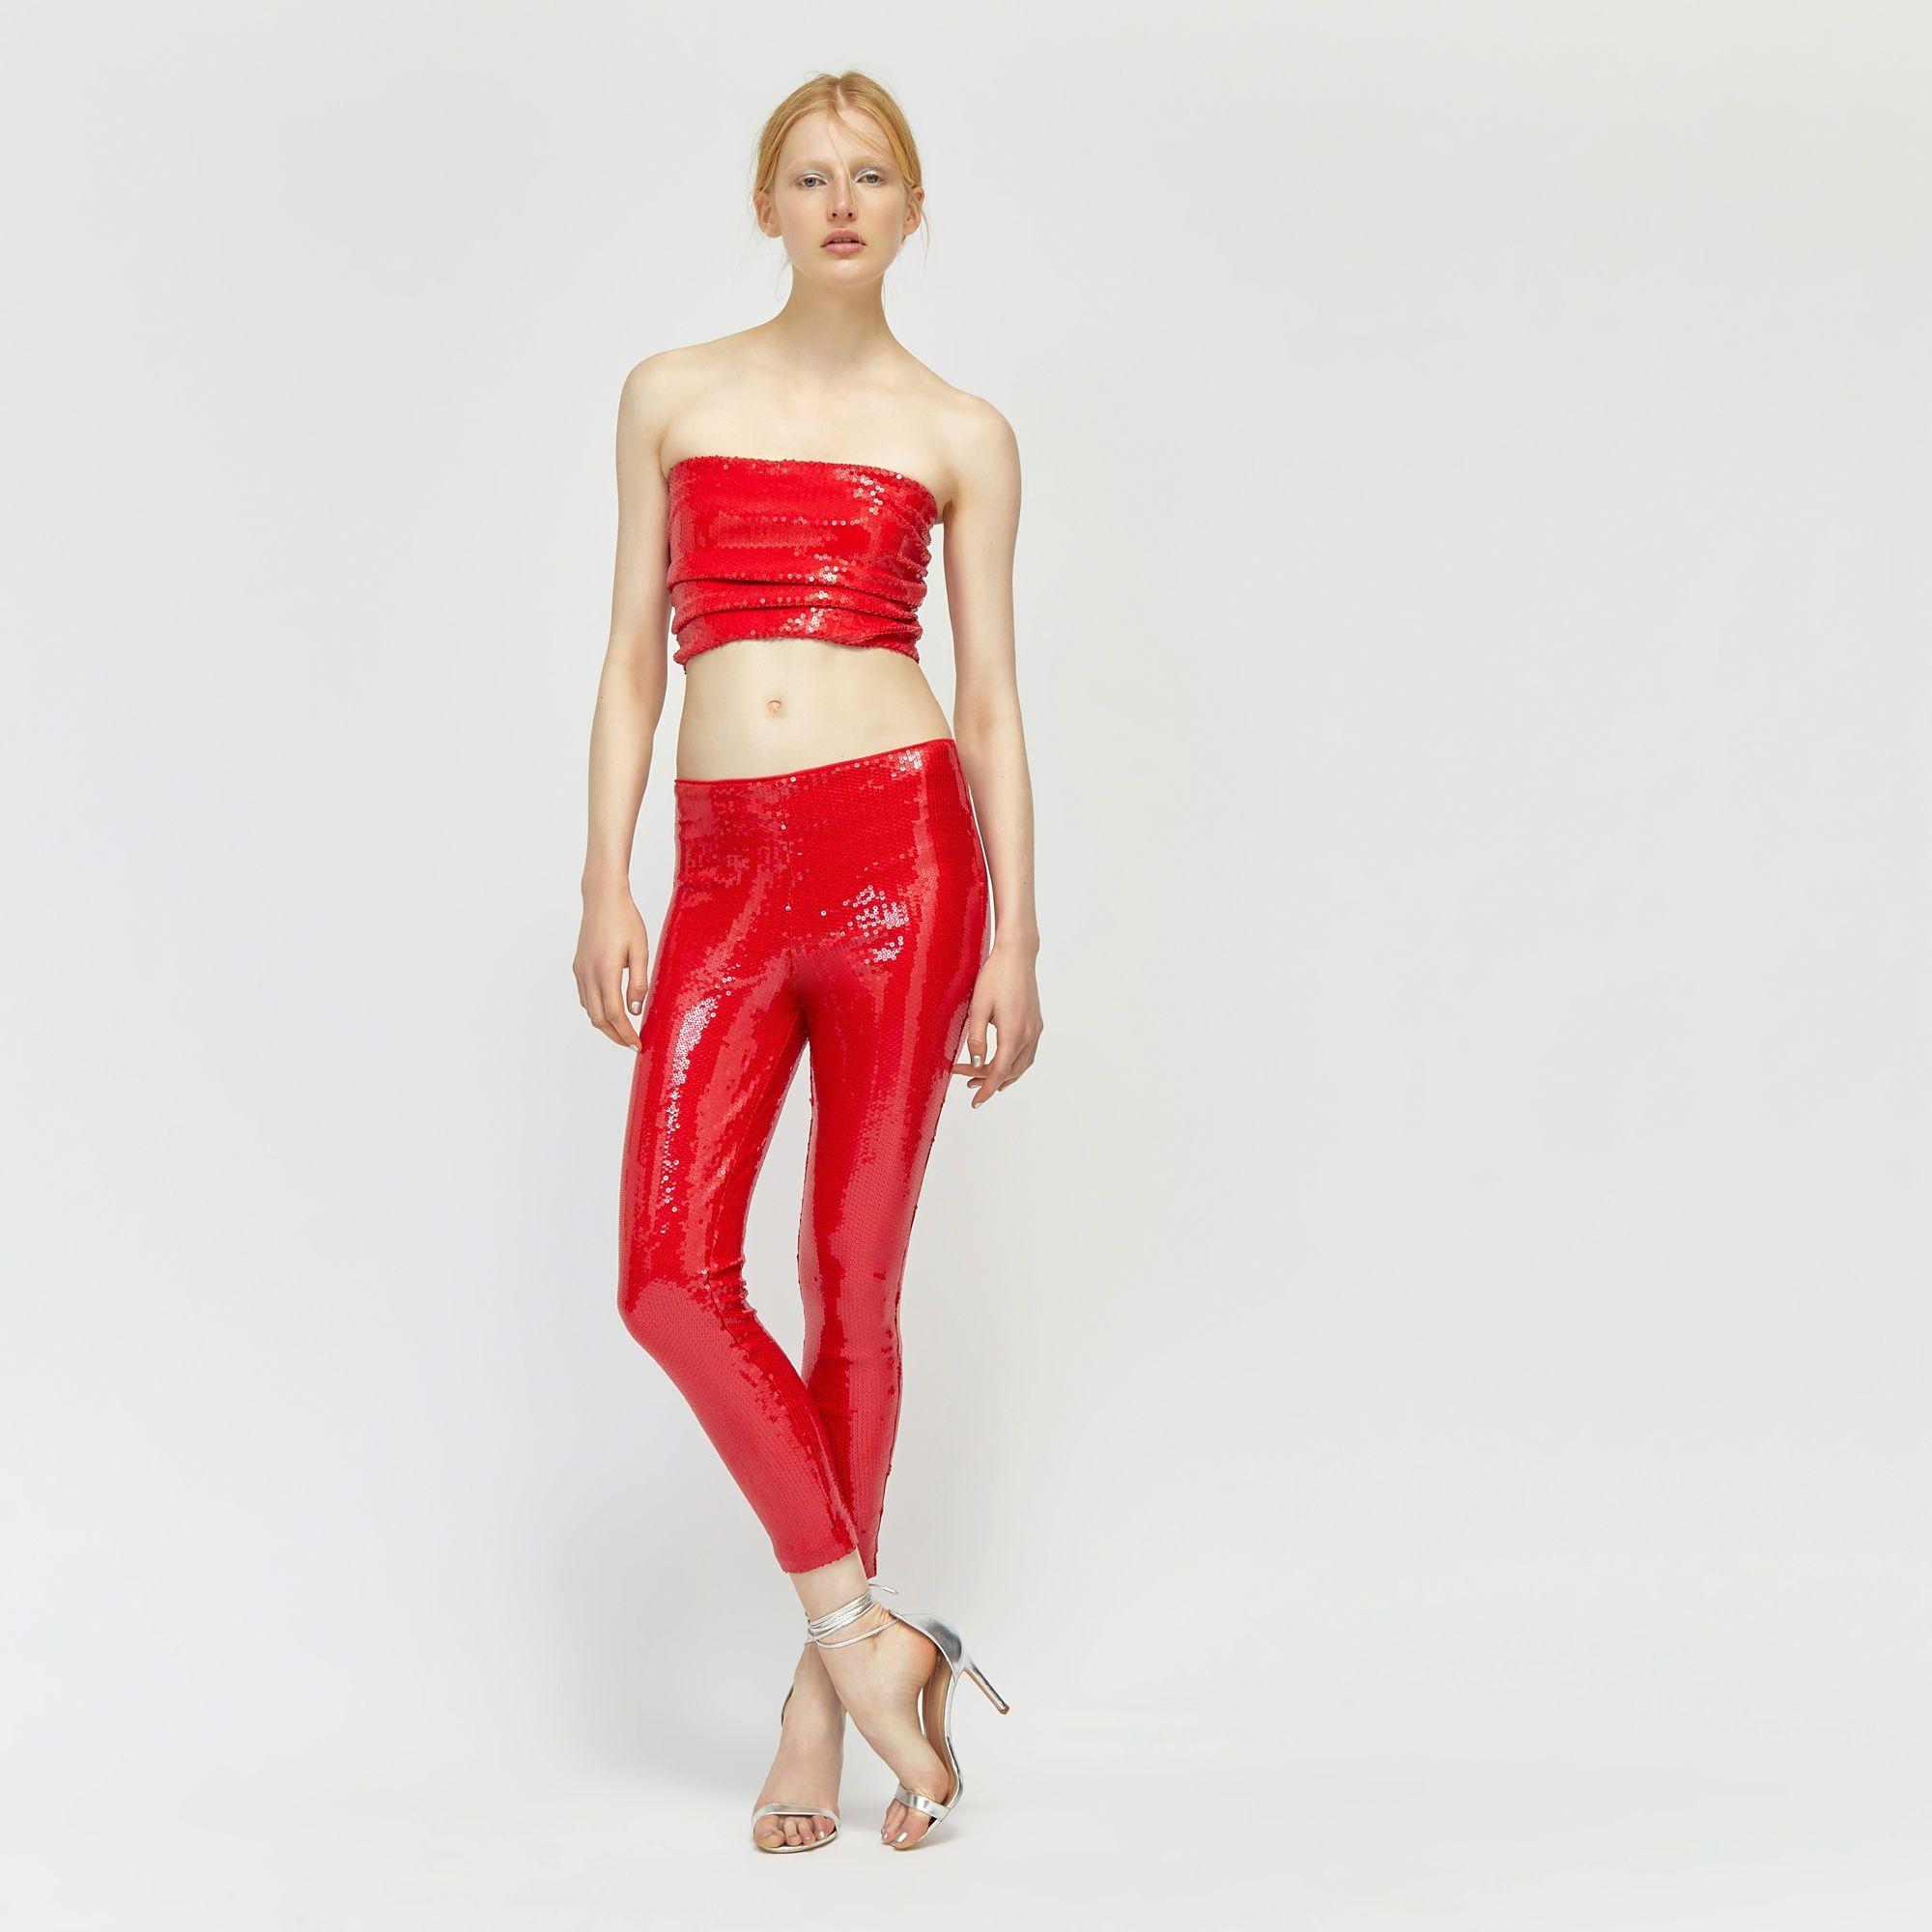 ff91f5bb853558 Ashish sequin leggings en 2018